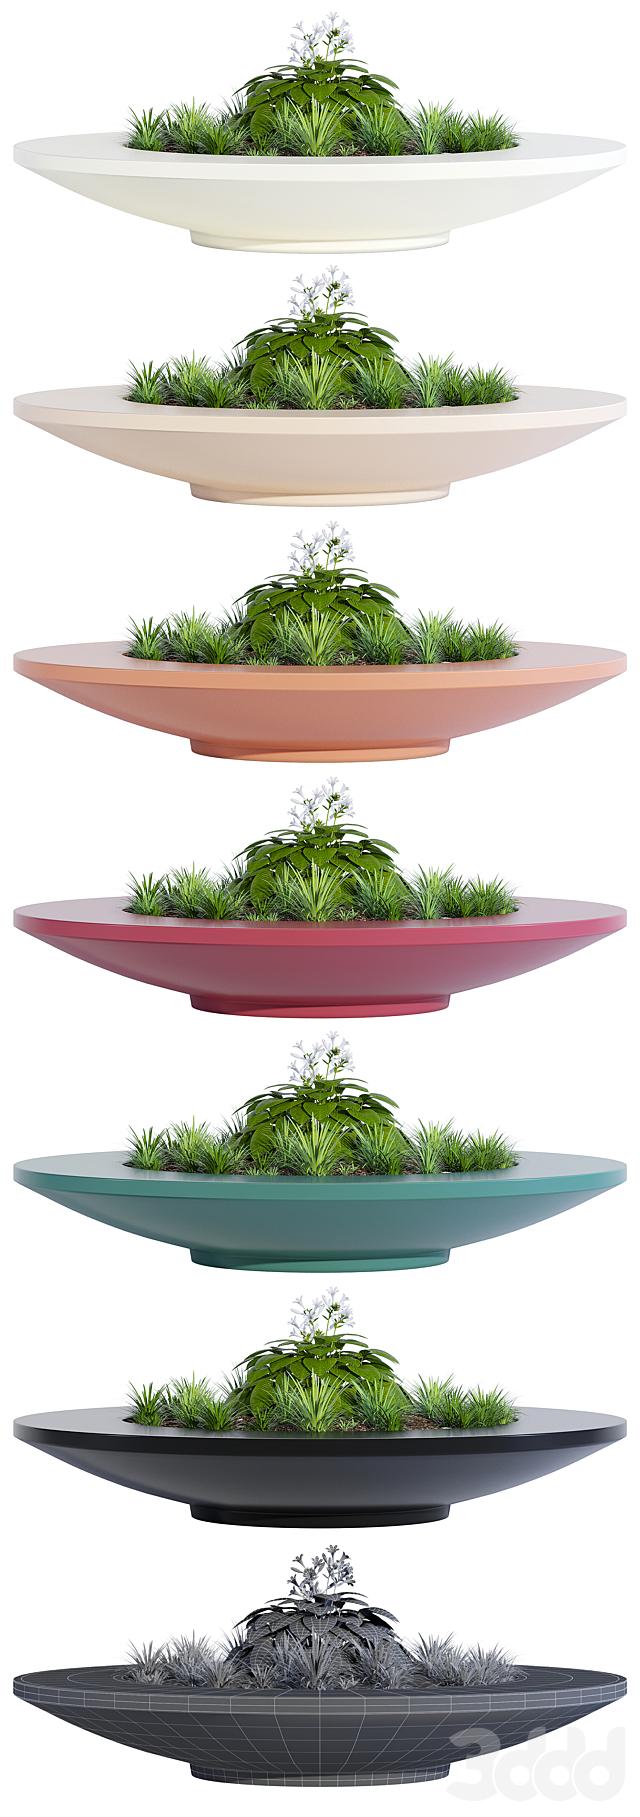 Rosetta bowl bench planter